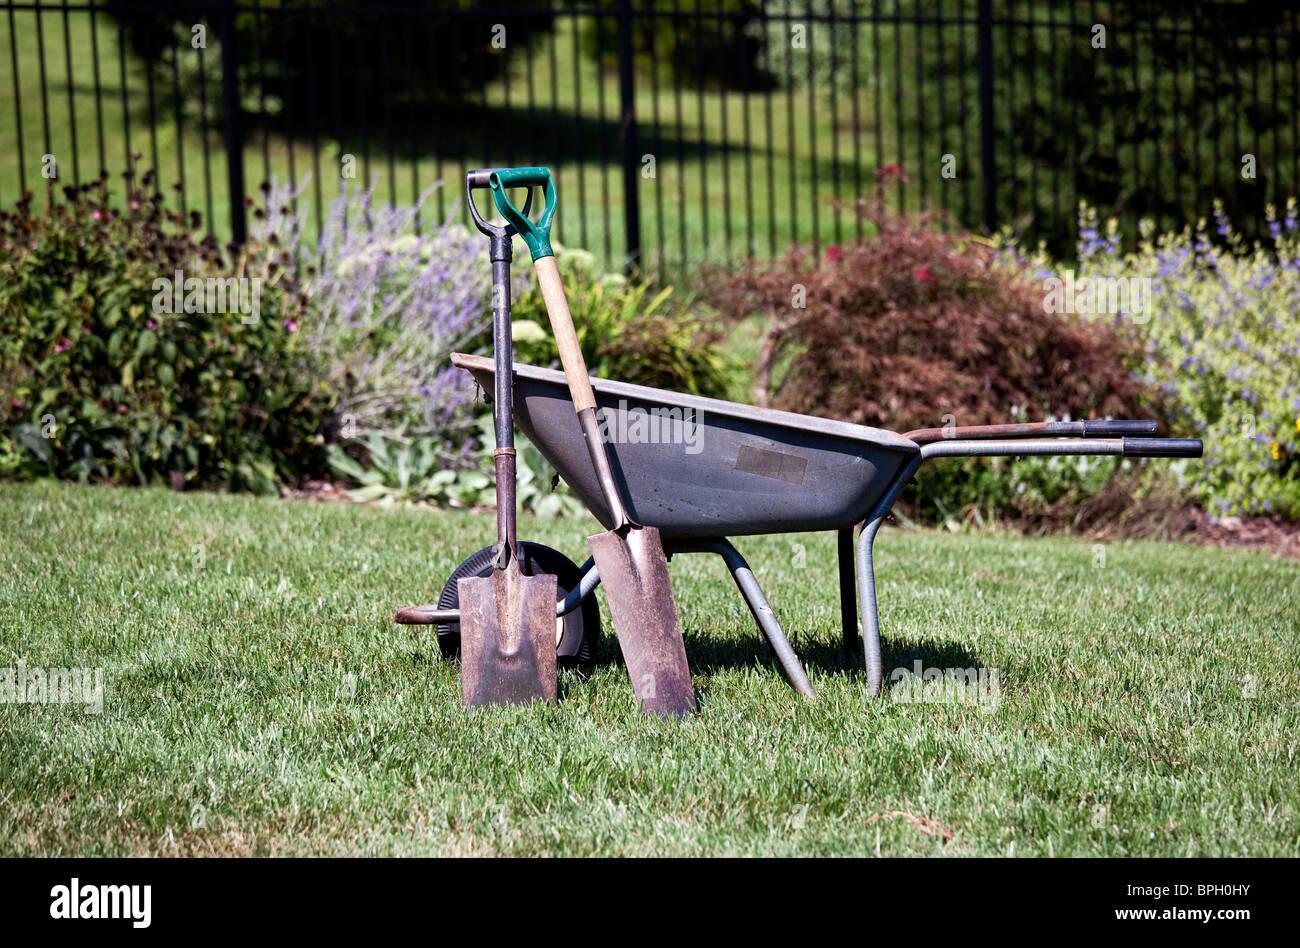 Garden tools - Pair of spades resting against a wheelbarrow in backyard garden - Stock Image